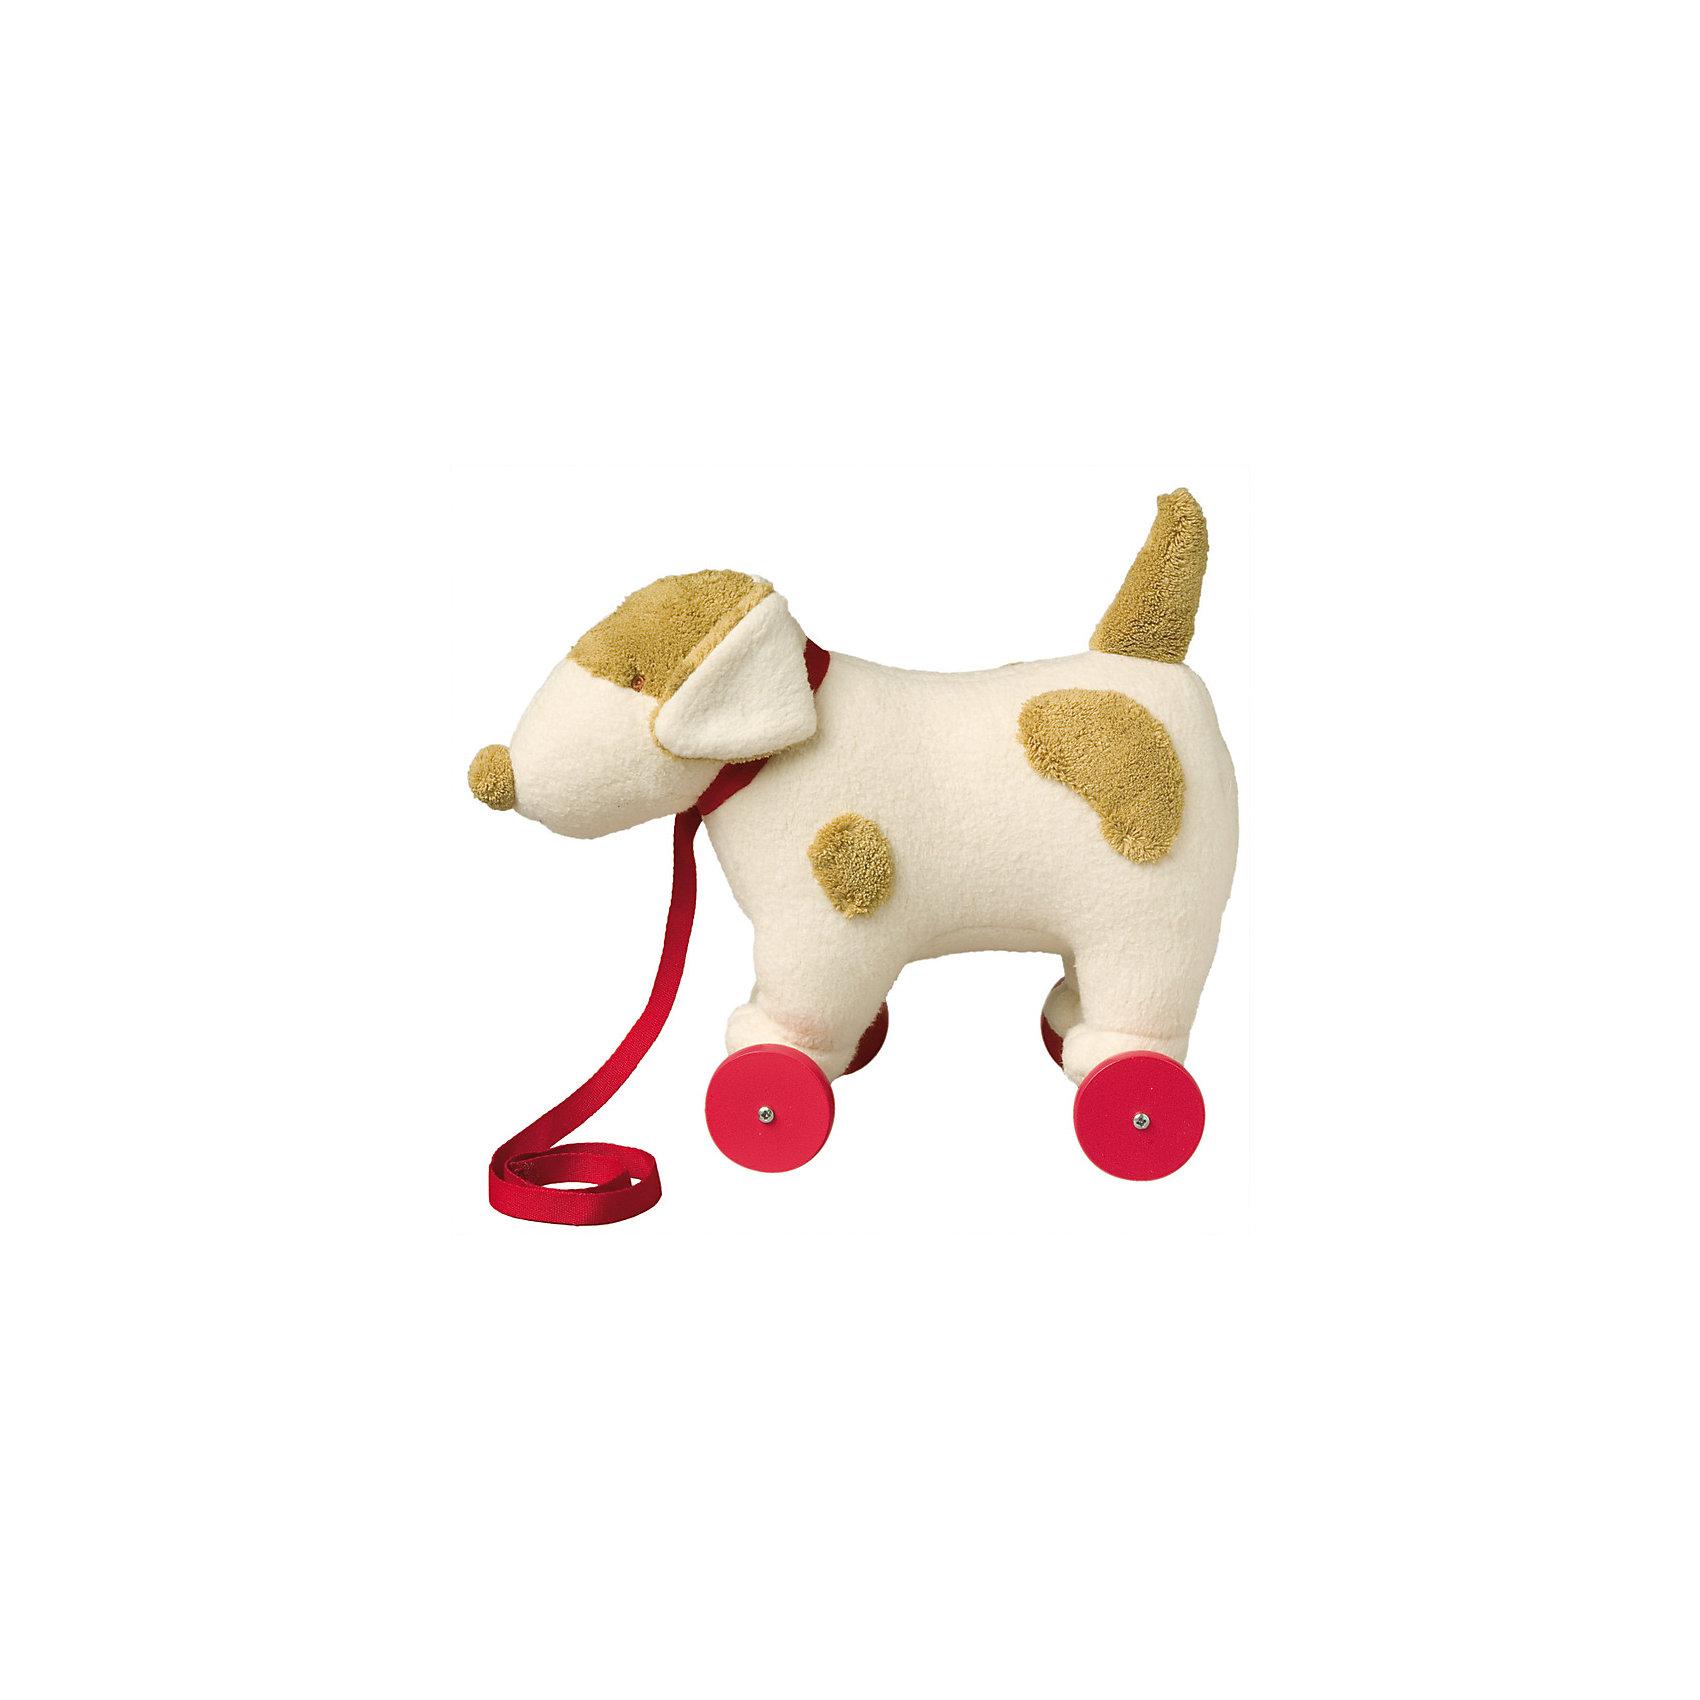 TROUSSELIER Мягкая игрушка Собака на колесиках с поводком, 32см, Trousselier trousselier светильник ночник балерина trousselier белый